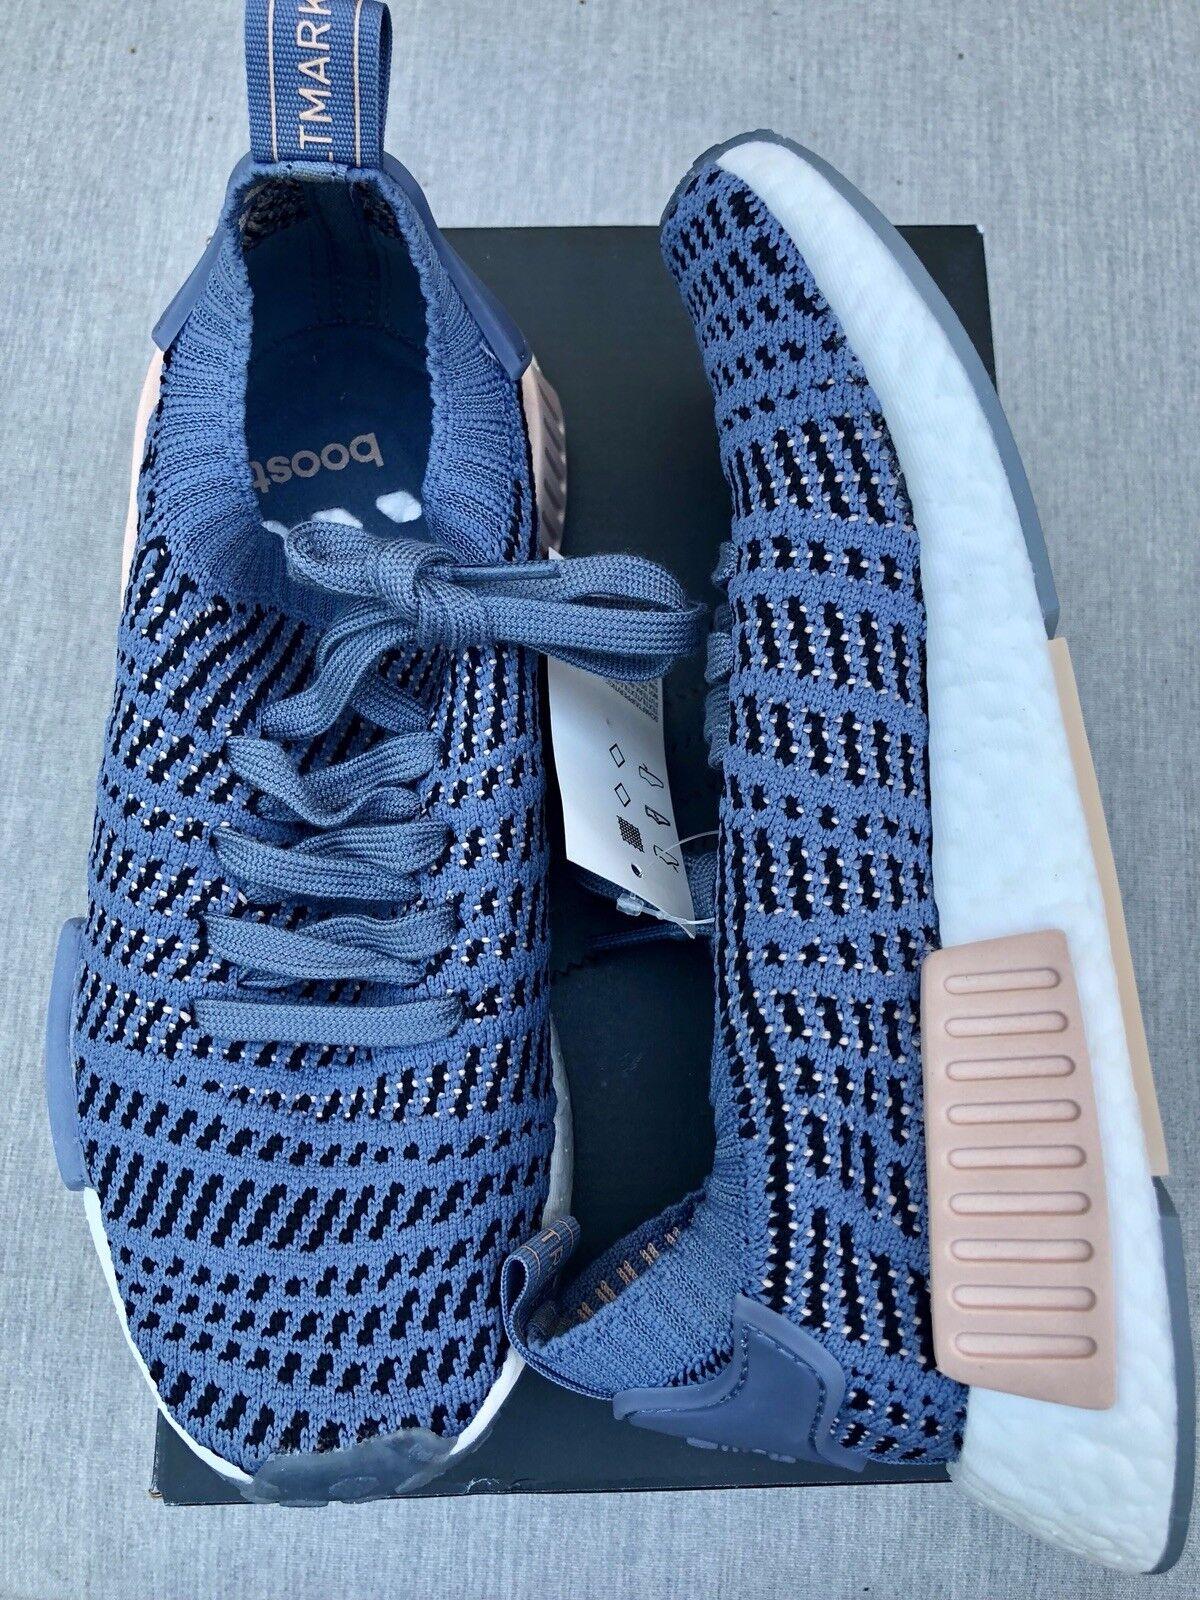 Adidas Originals NMD R1 STLT PK Women bluee Ash Pearl CQ2029 size 6 Brand New